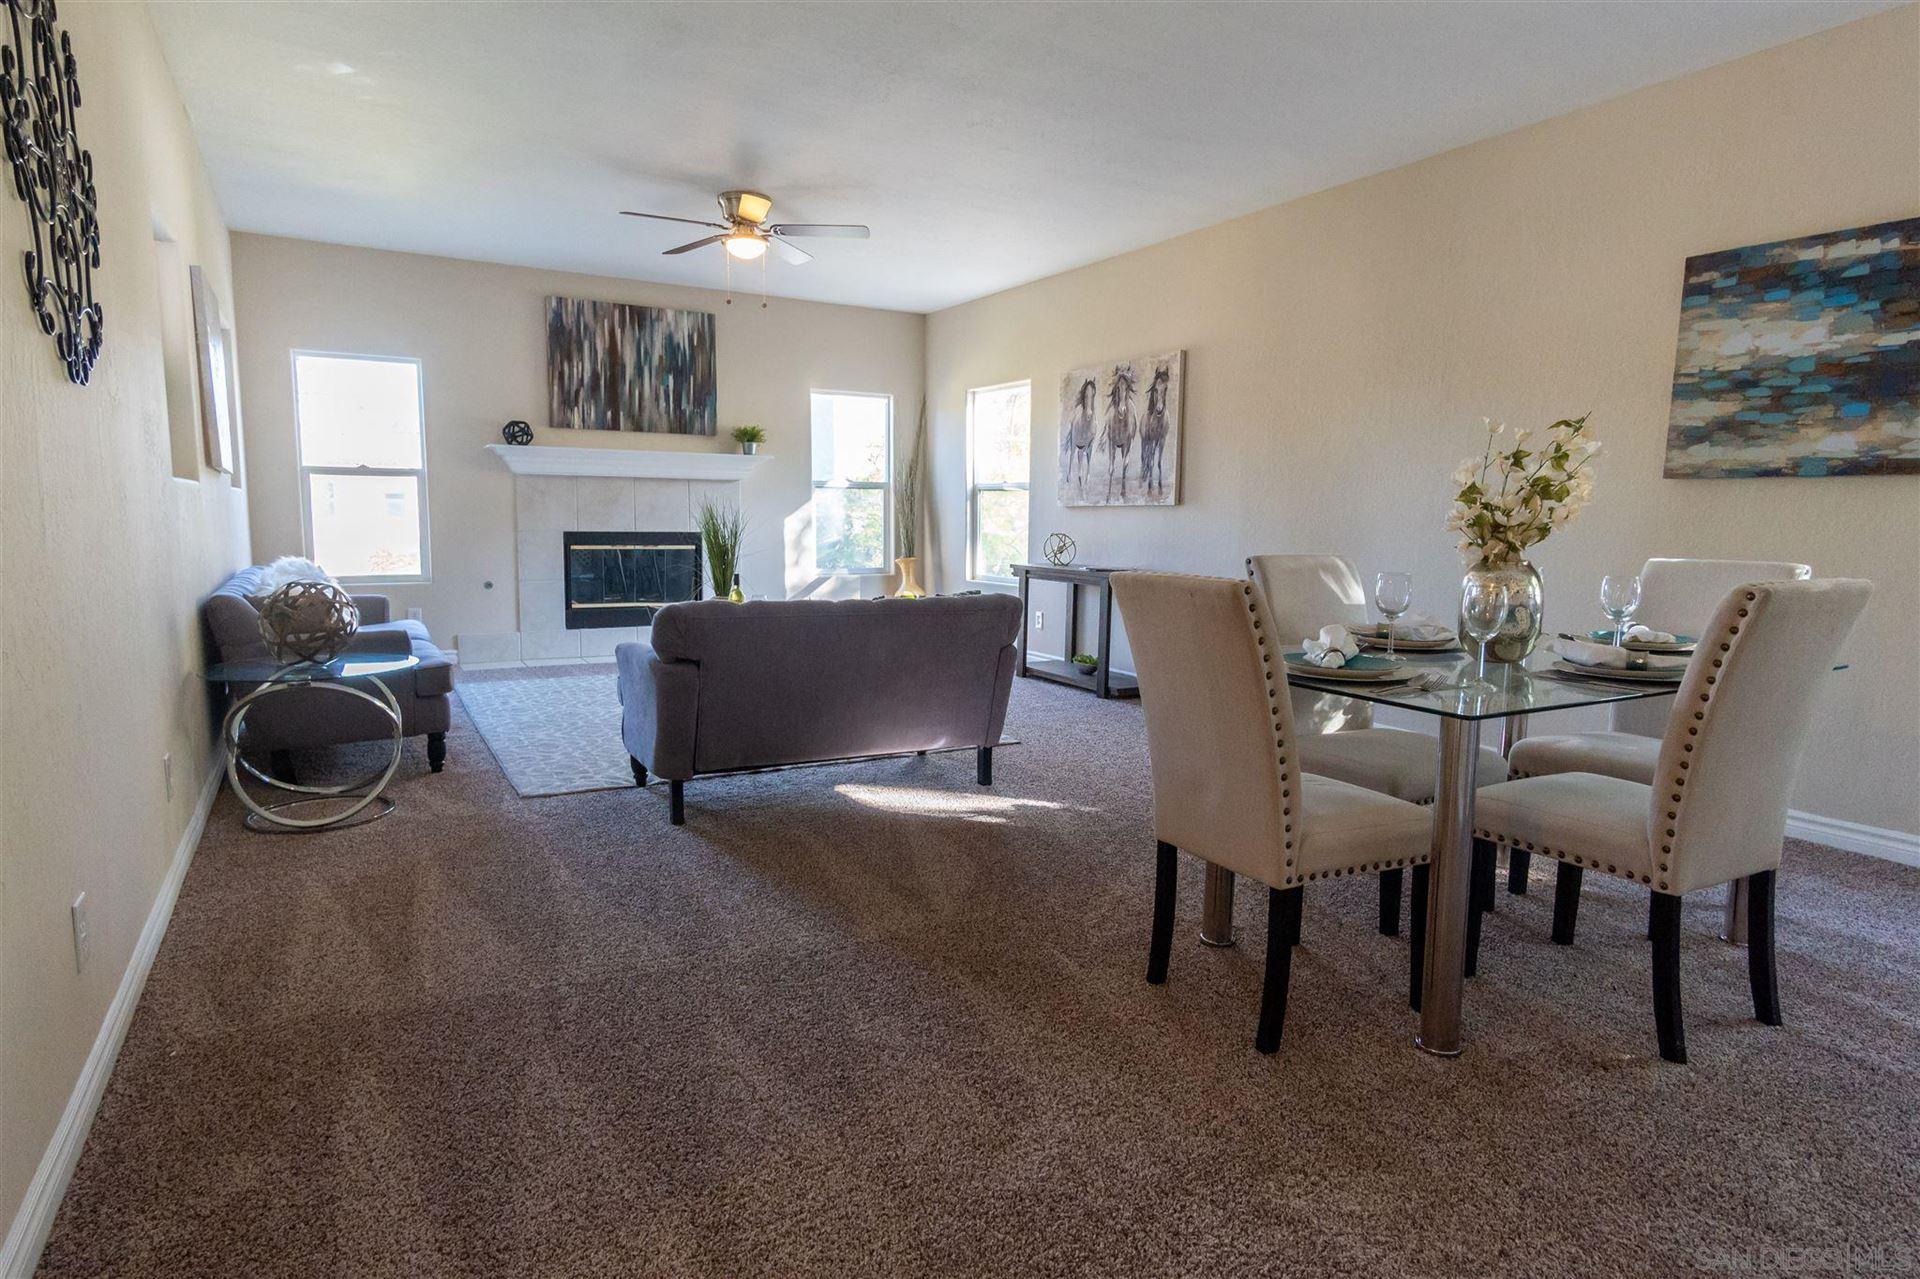 Photo of 2065 Cherokee Ln, Escondido, CA 92026 (MLS # 210000616)